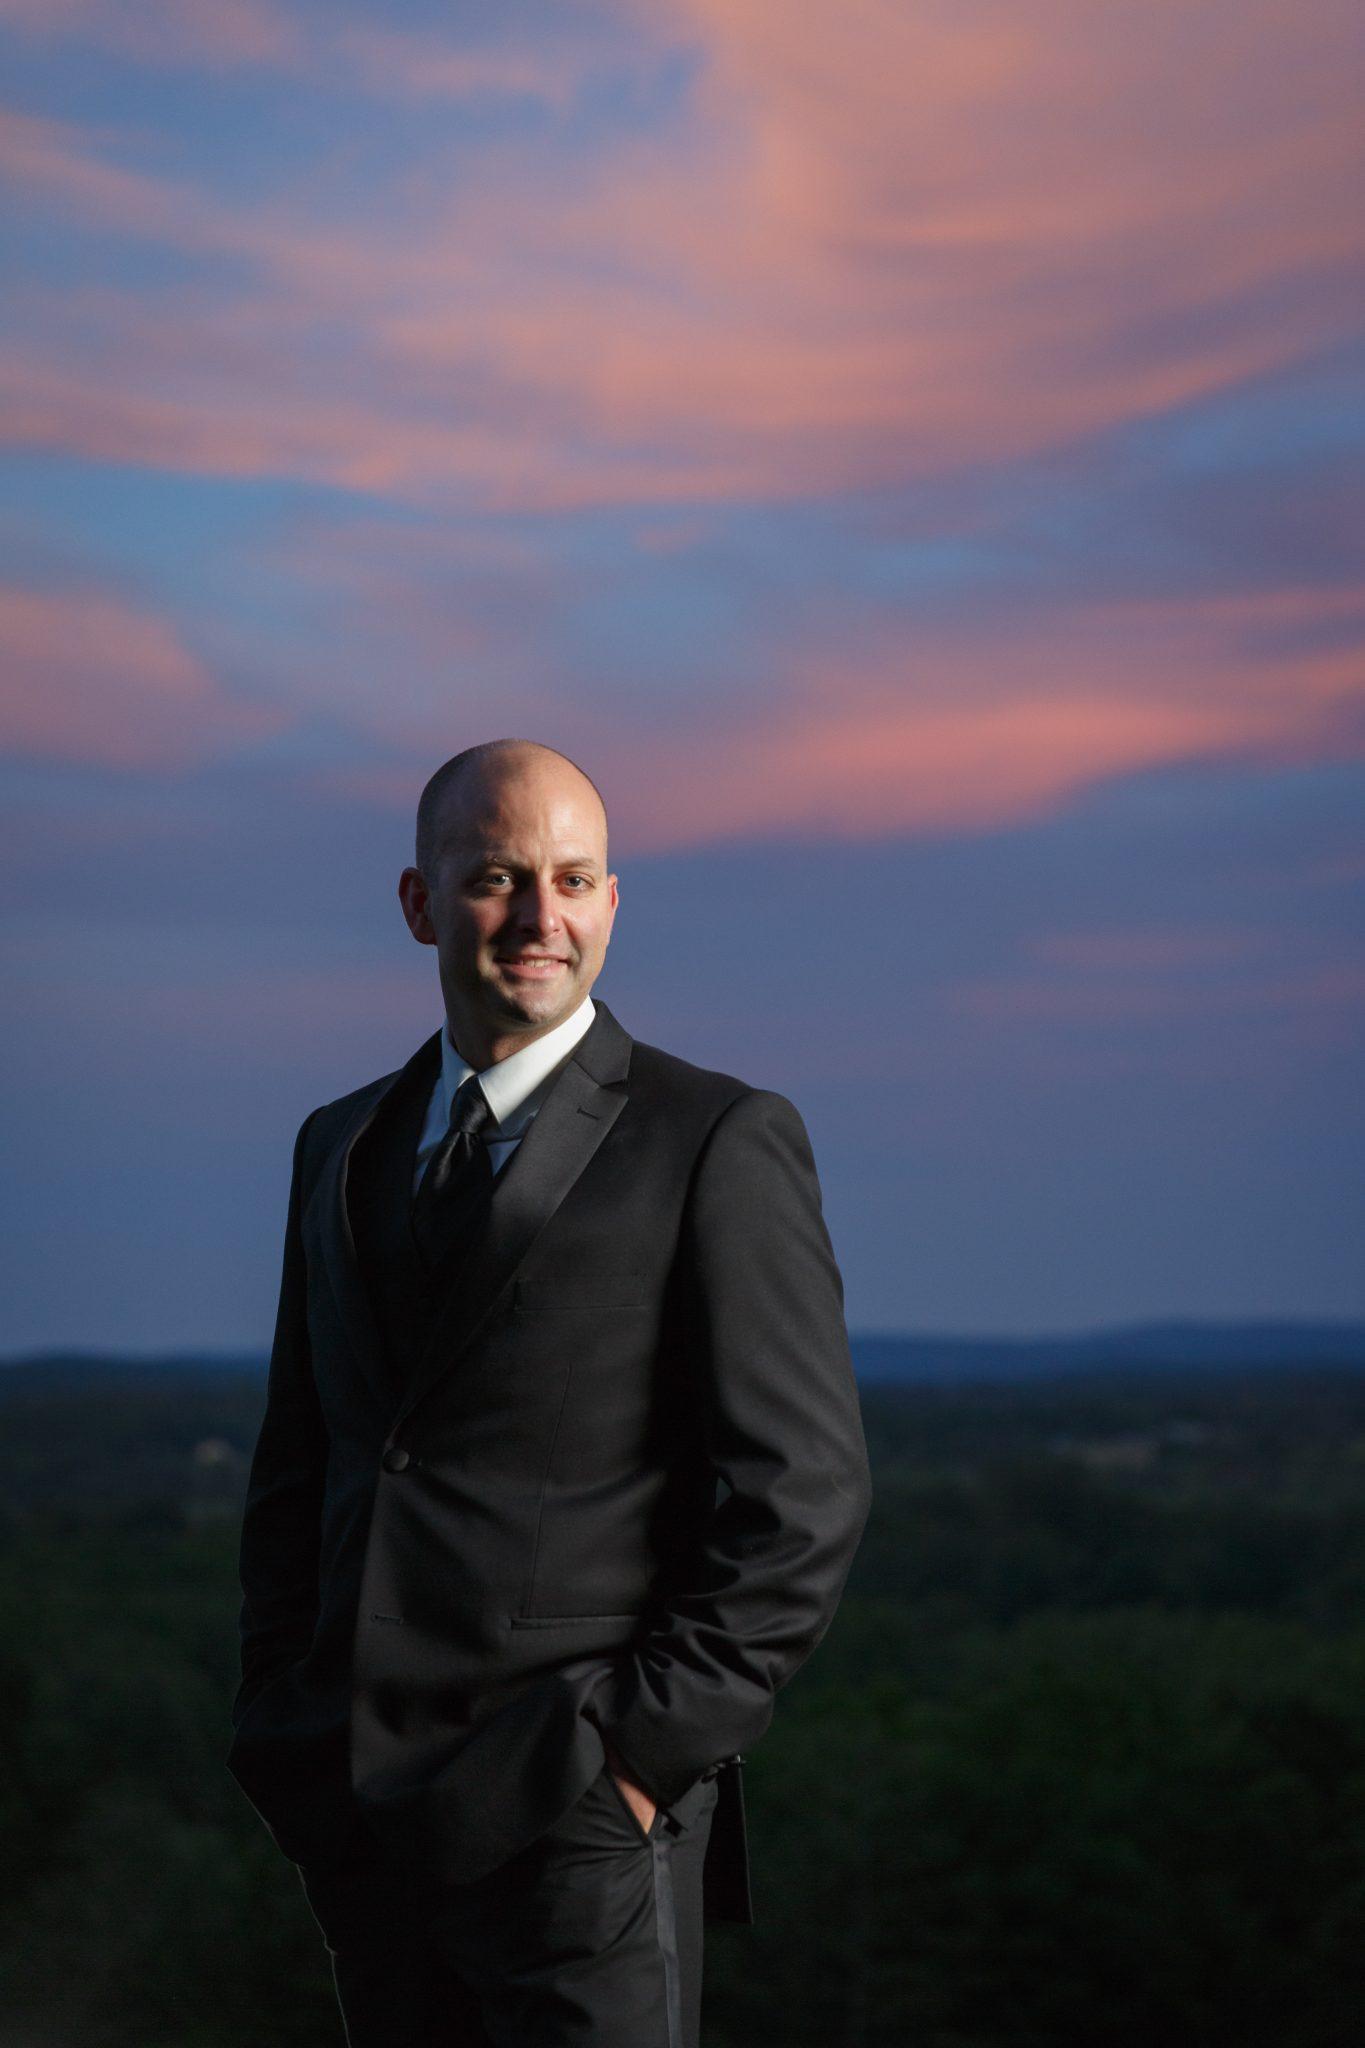 Sunset groom portrait